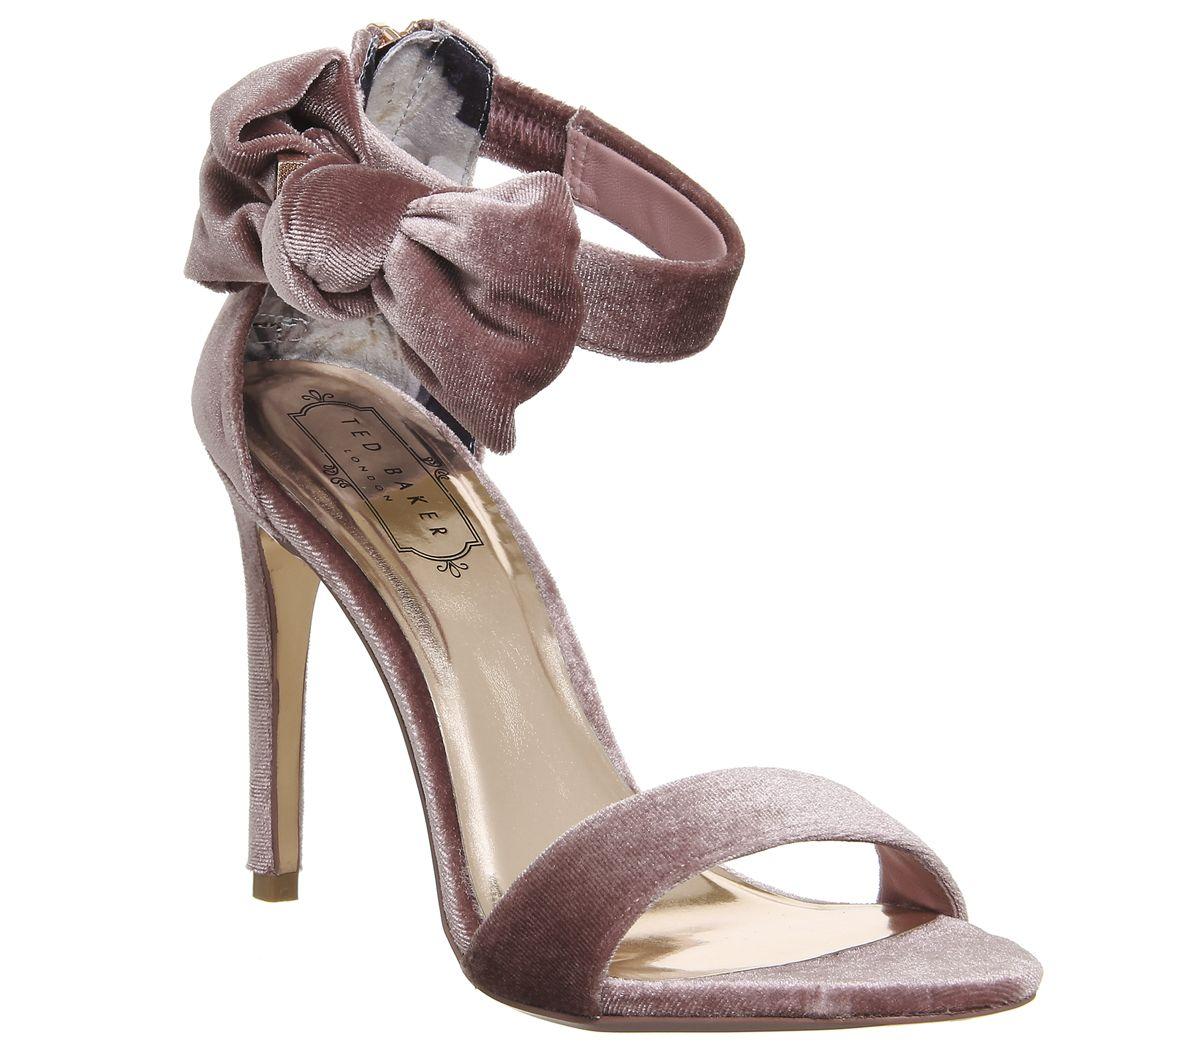 deba1ecd49 Torabel Bow Heels. Torabel Bow Heels. Torabel Bow Heels. Torabel Bow Heels. Double  tap to zoom into the image. Ted Baker ...